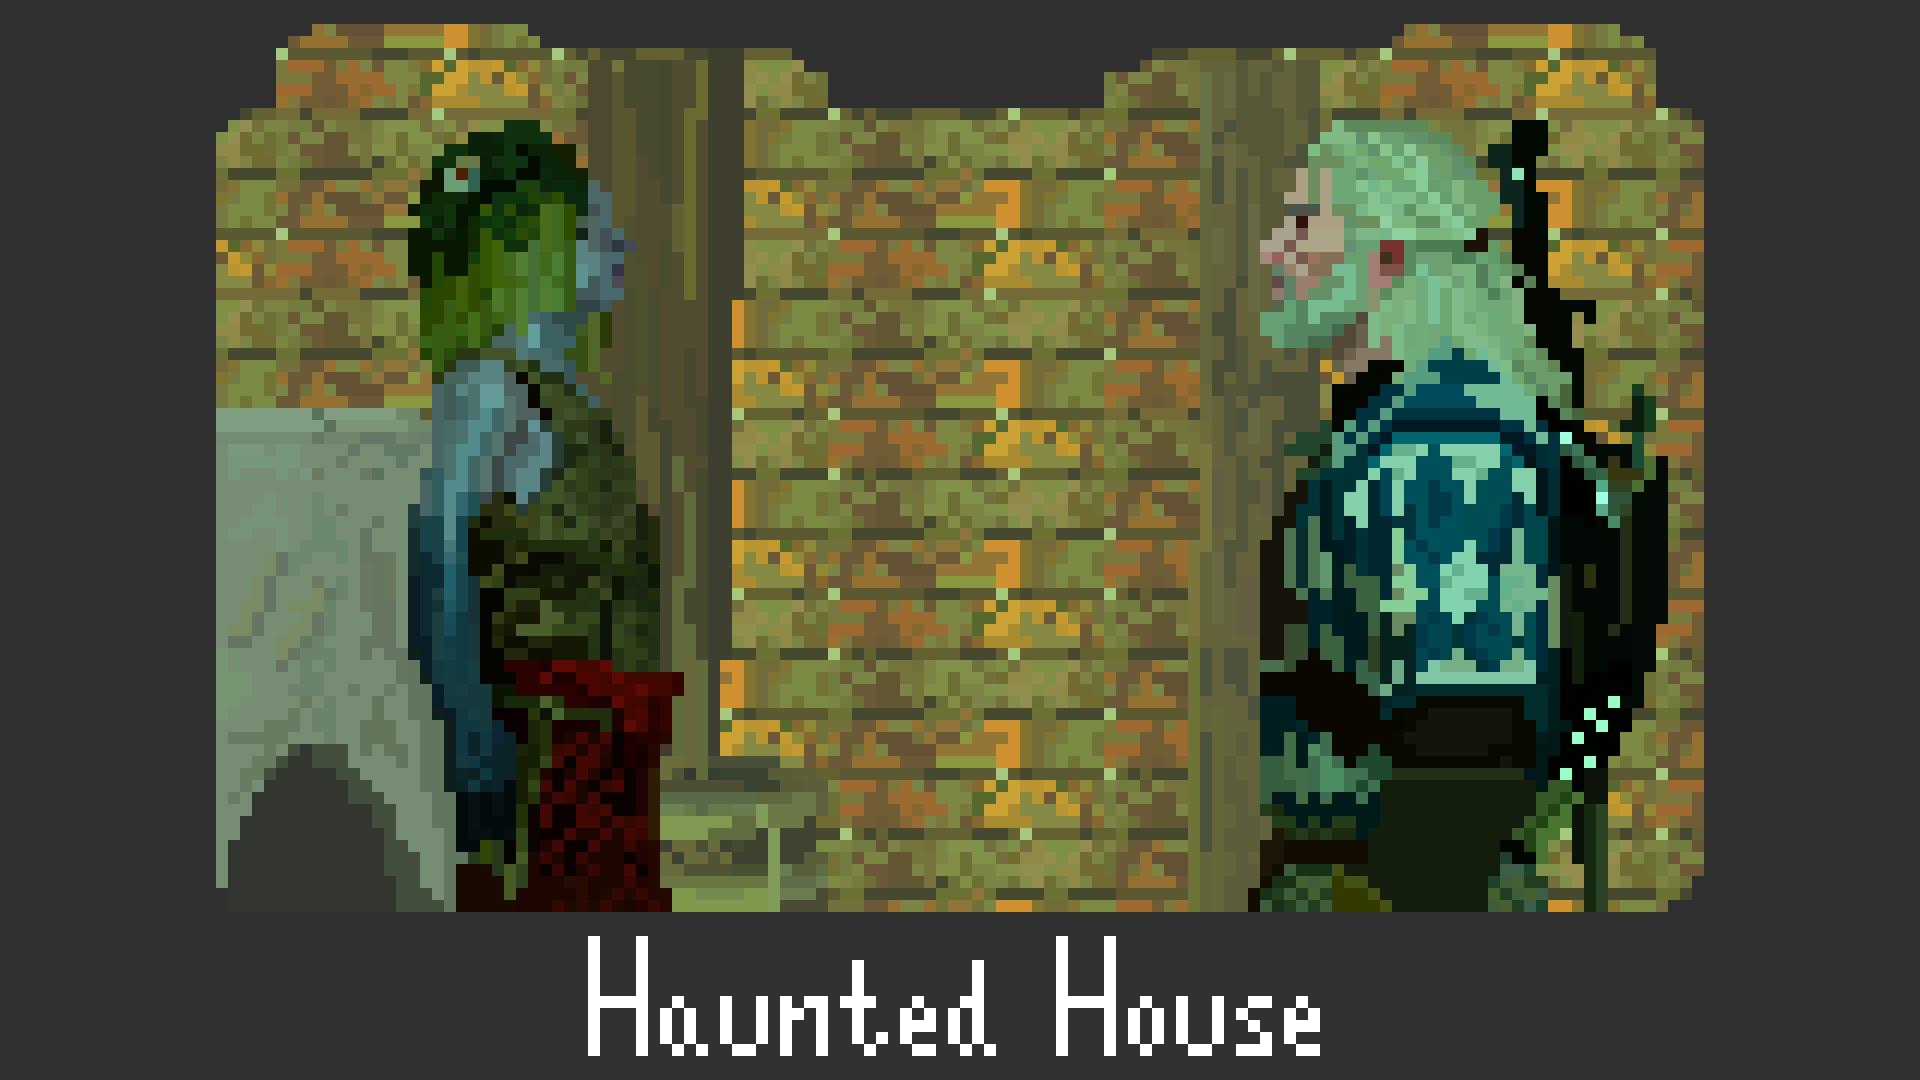 Jordan cameron hauntedhouse bright